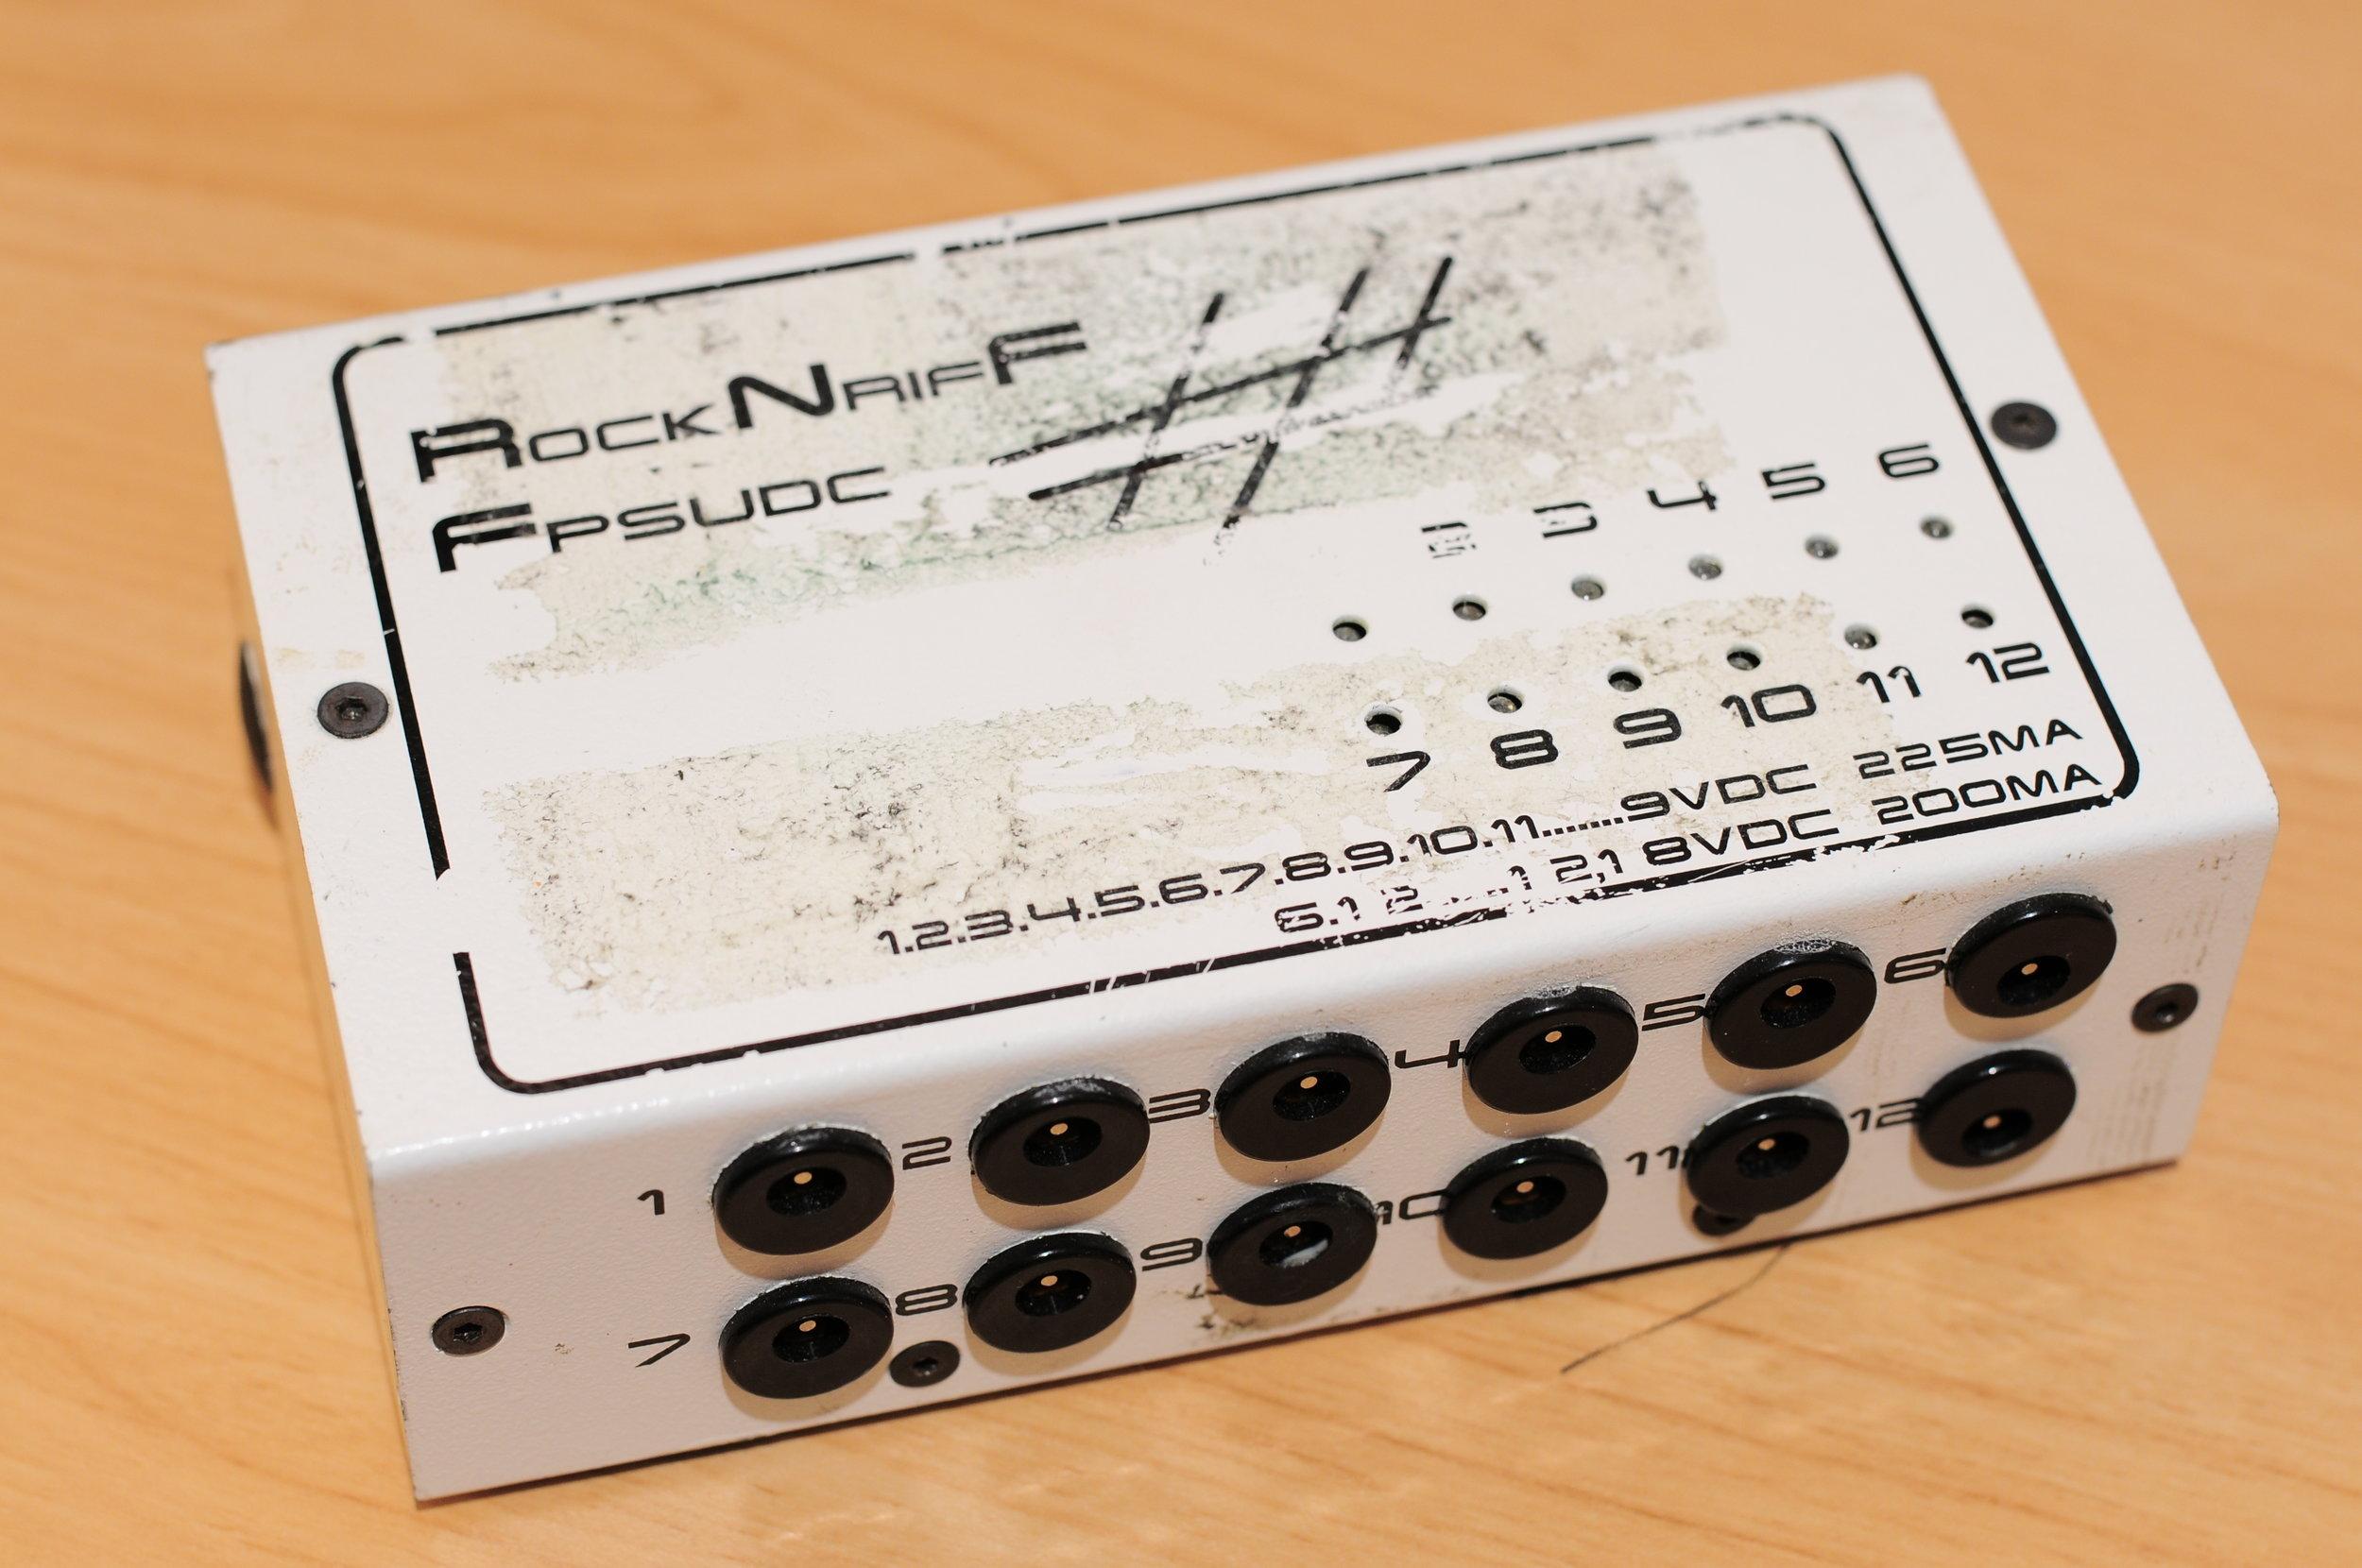 RockNriff FPSU-DC.JPG